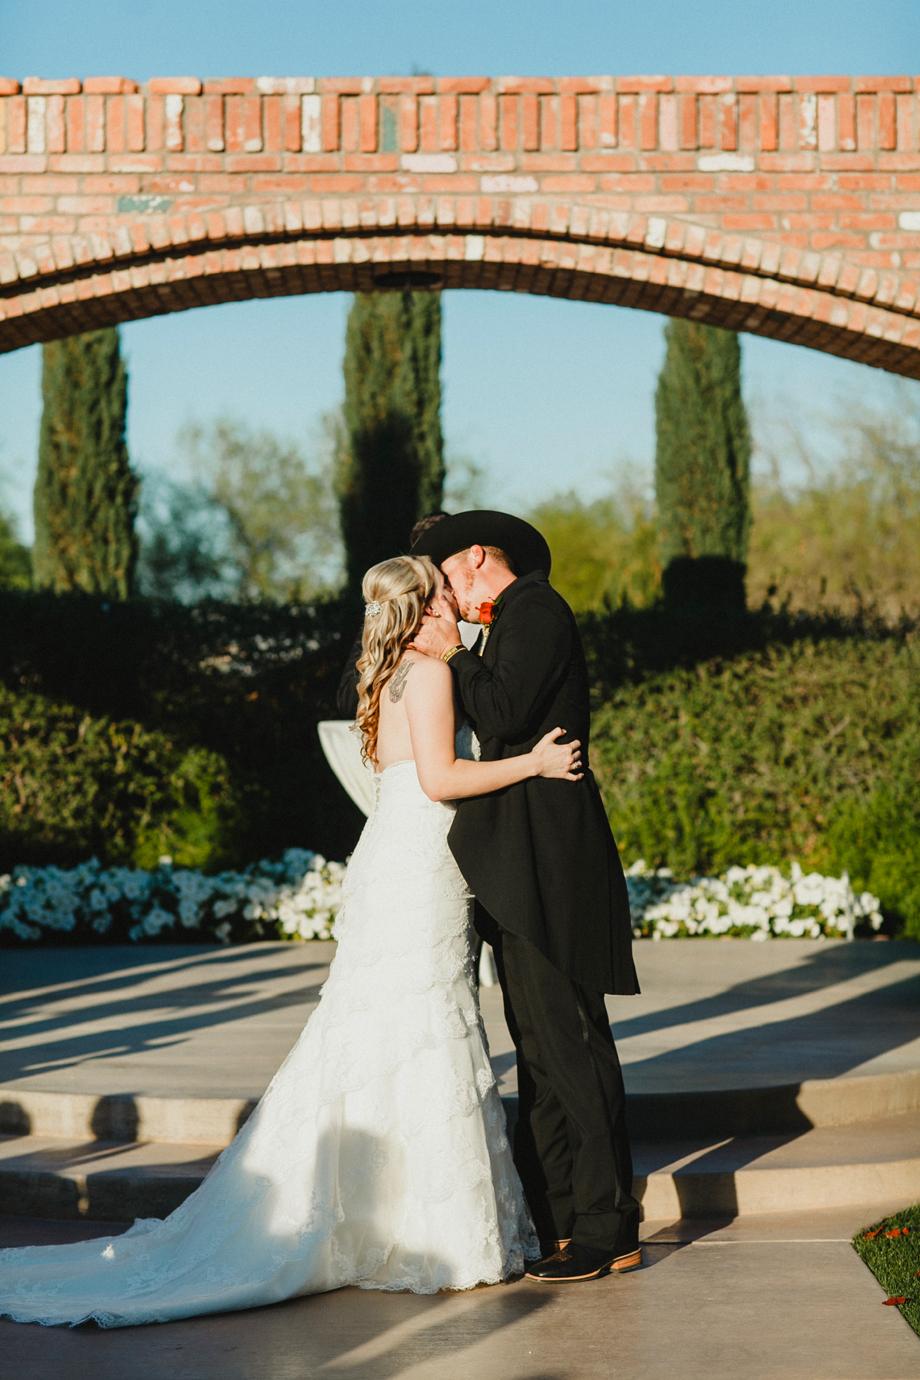 Jay & Jess, Weddings, Arizona-36.jpg